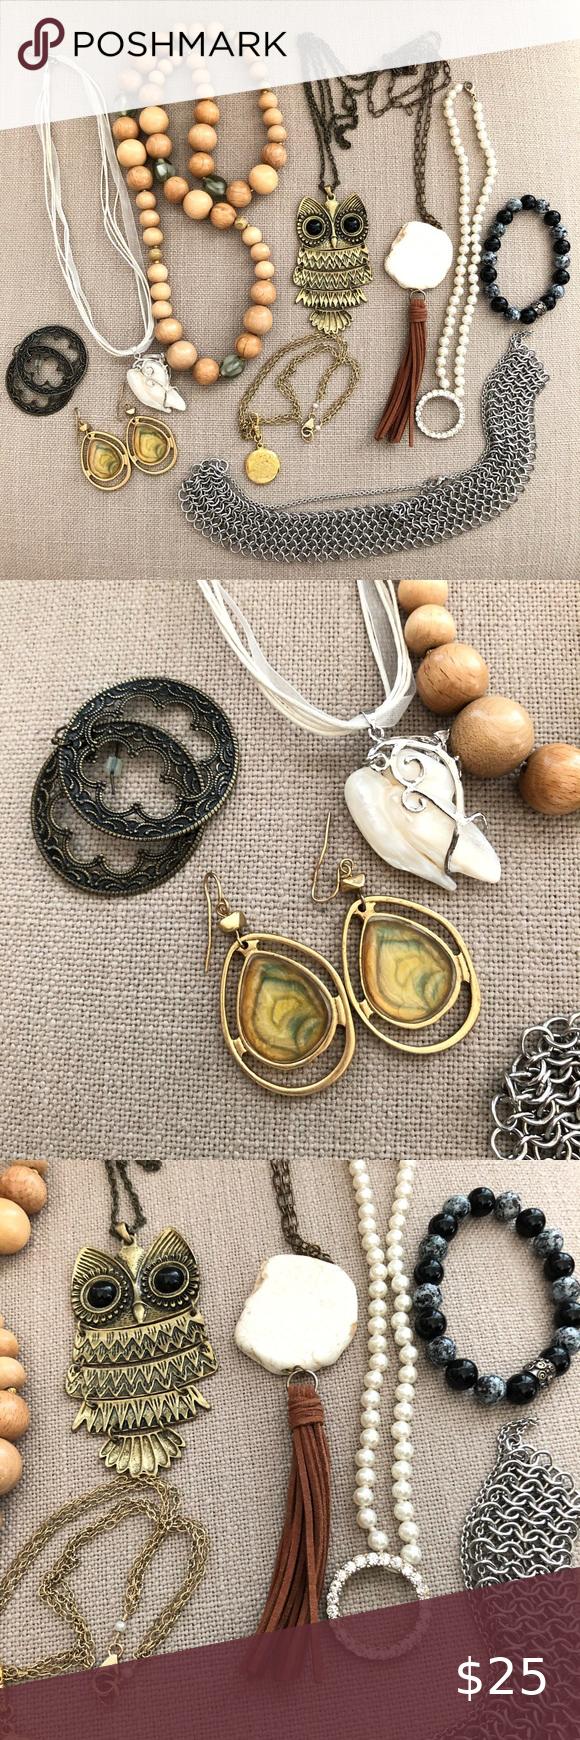 Boho Mixed Jewelry Lot Bundle 10 Pieces Necklaces